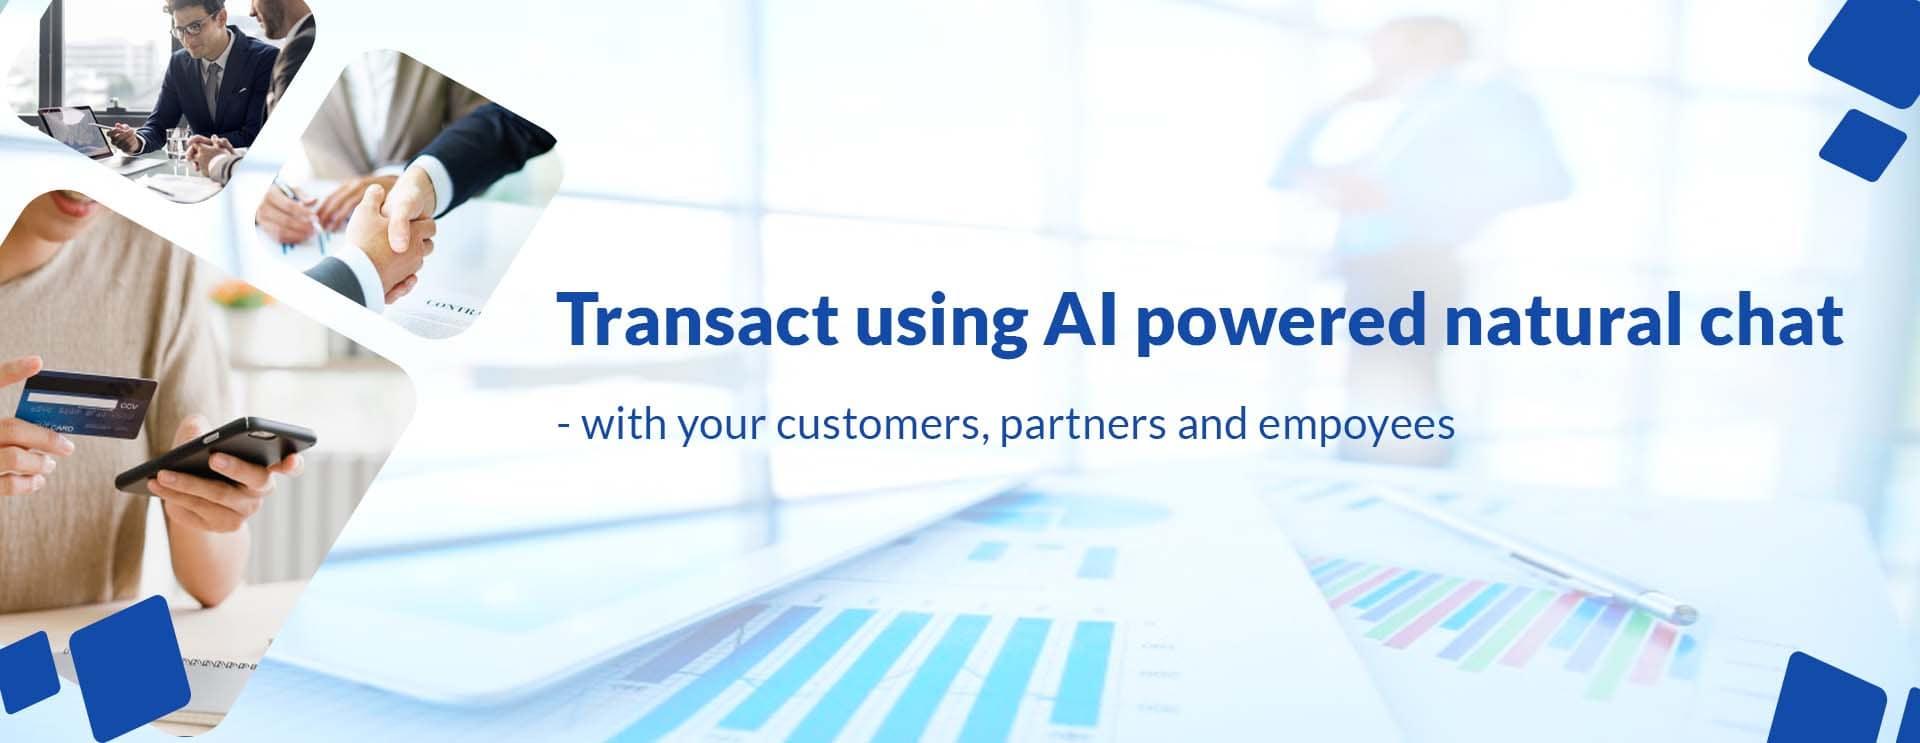 AI powered natural chat